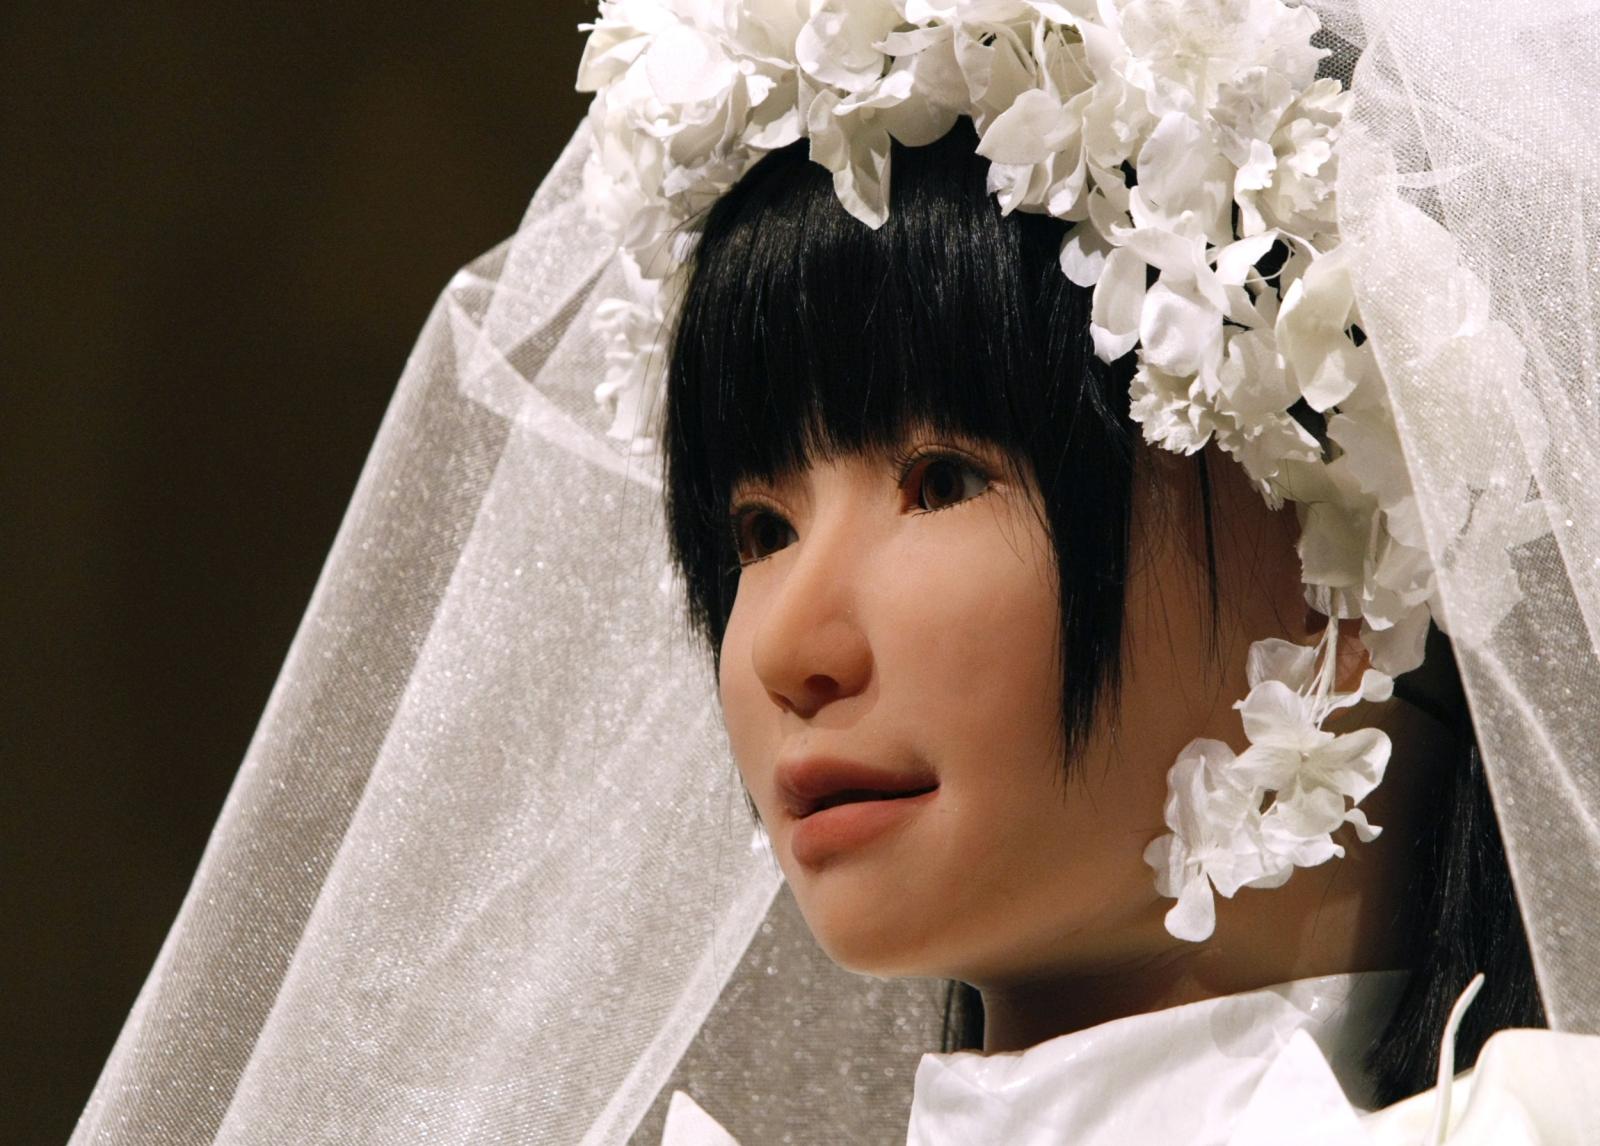 robot marriage 2050